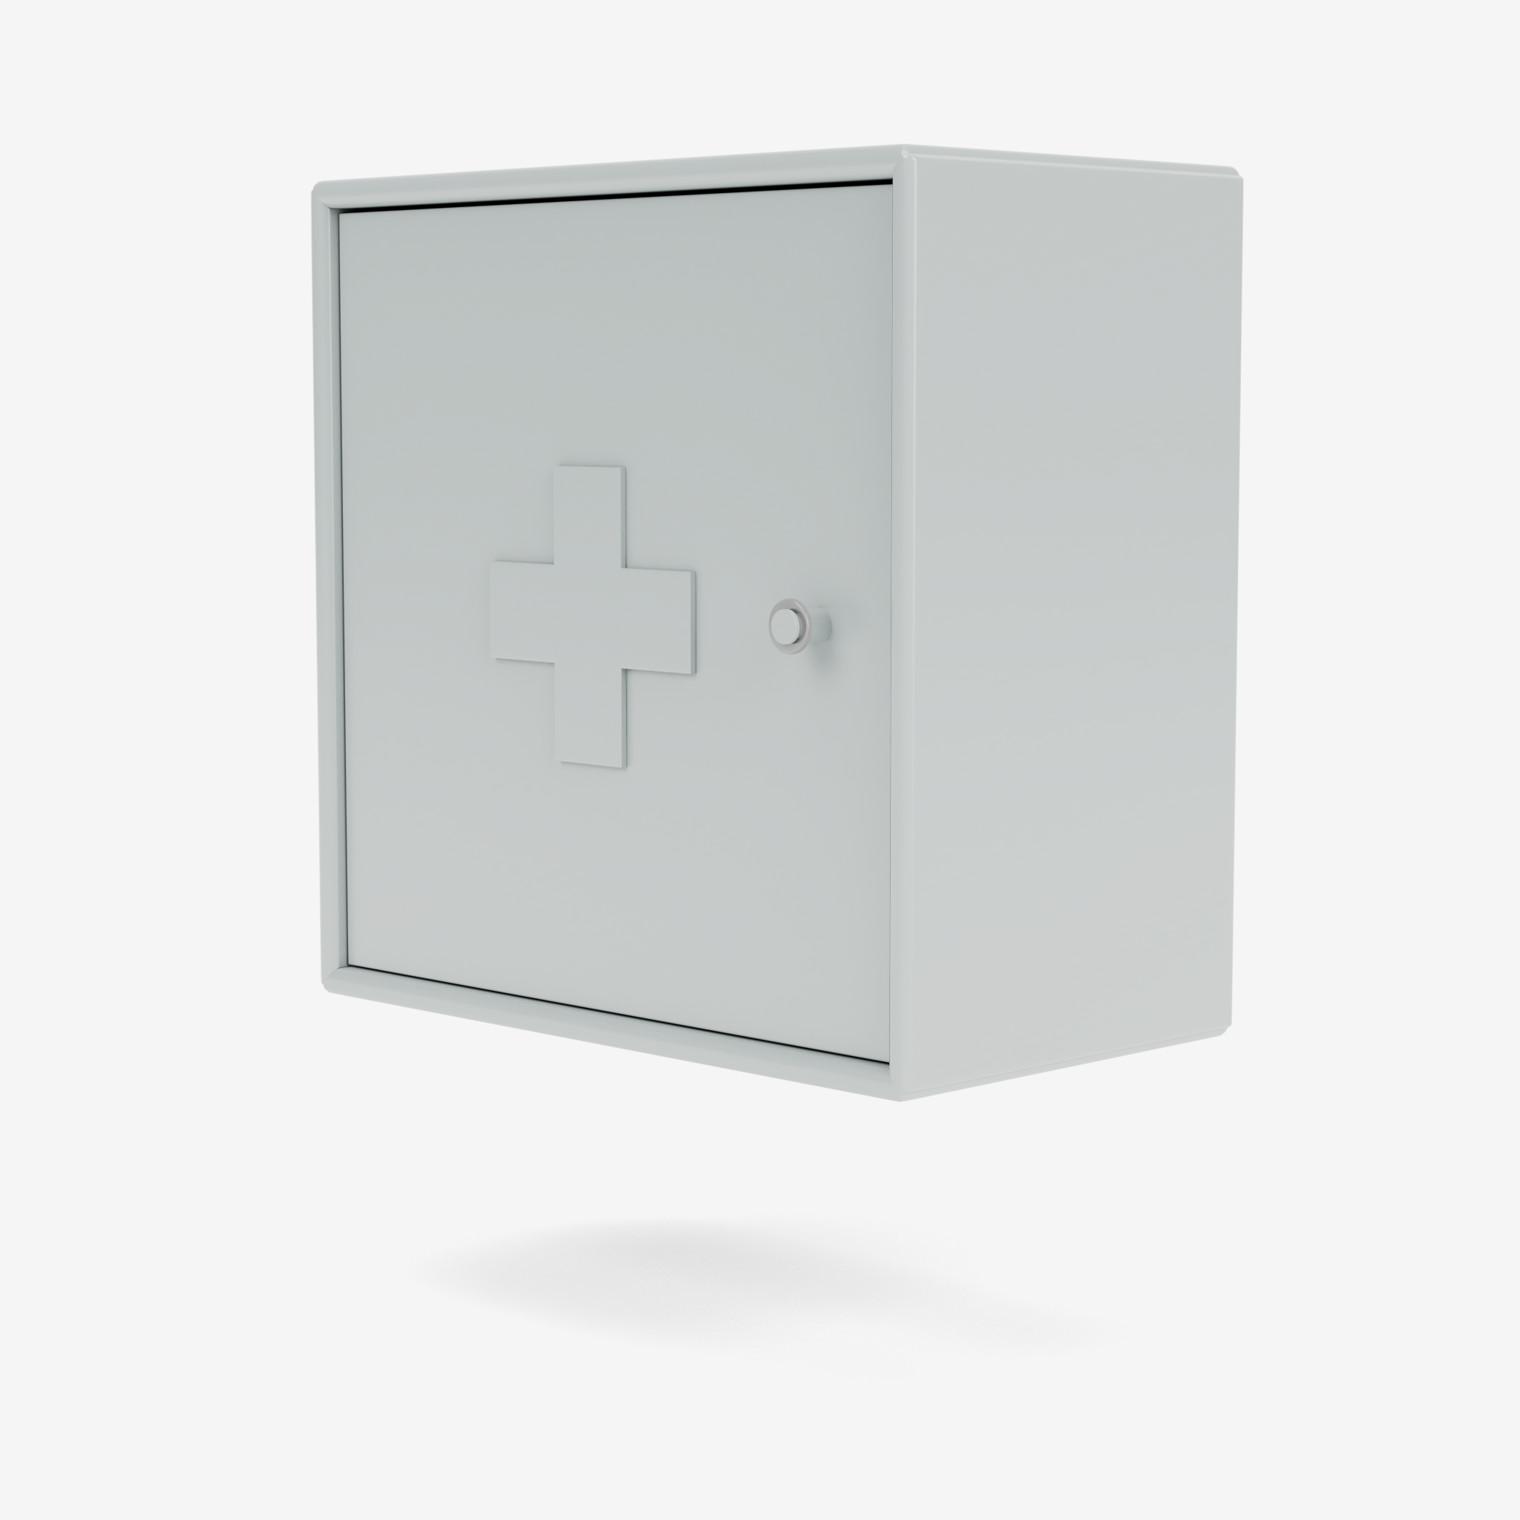 AID medicine cabinet